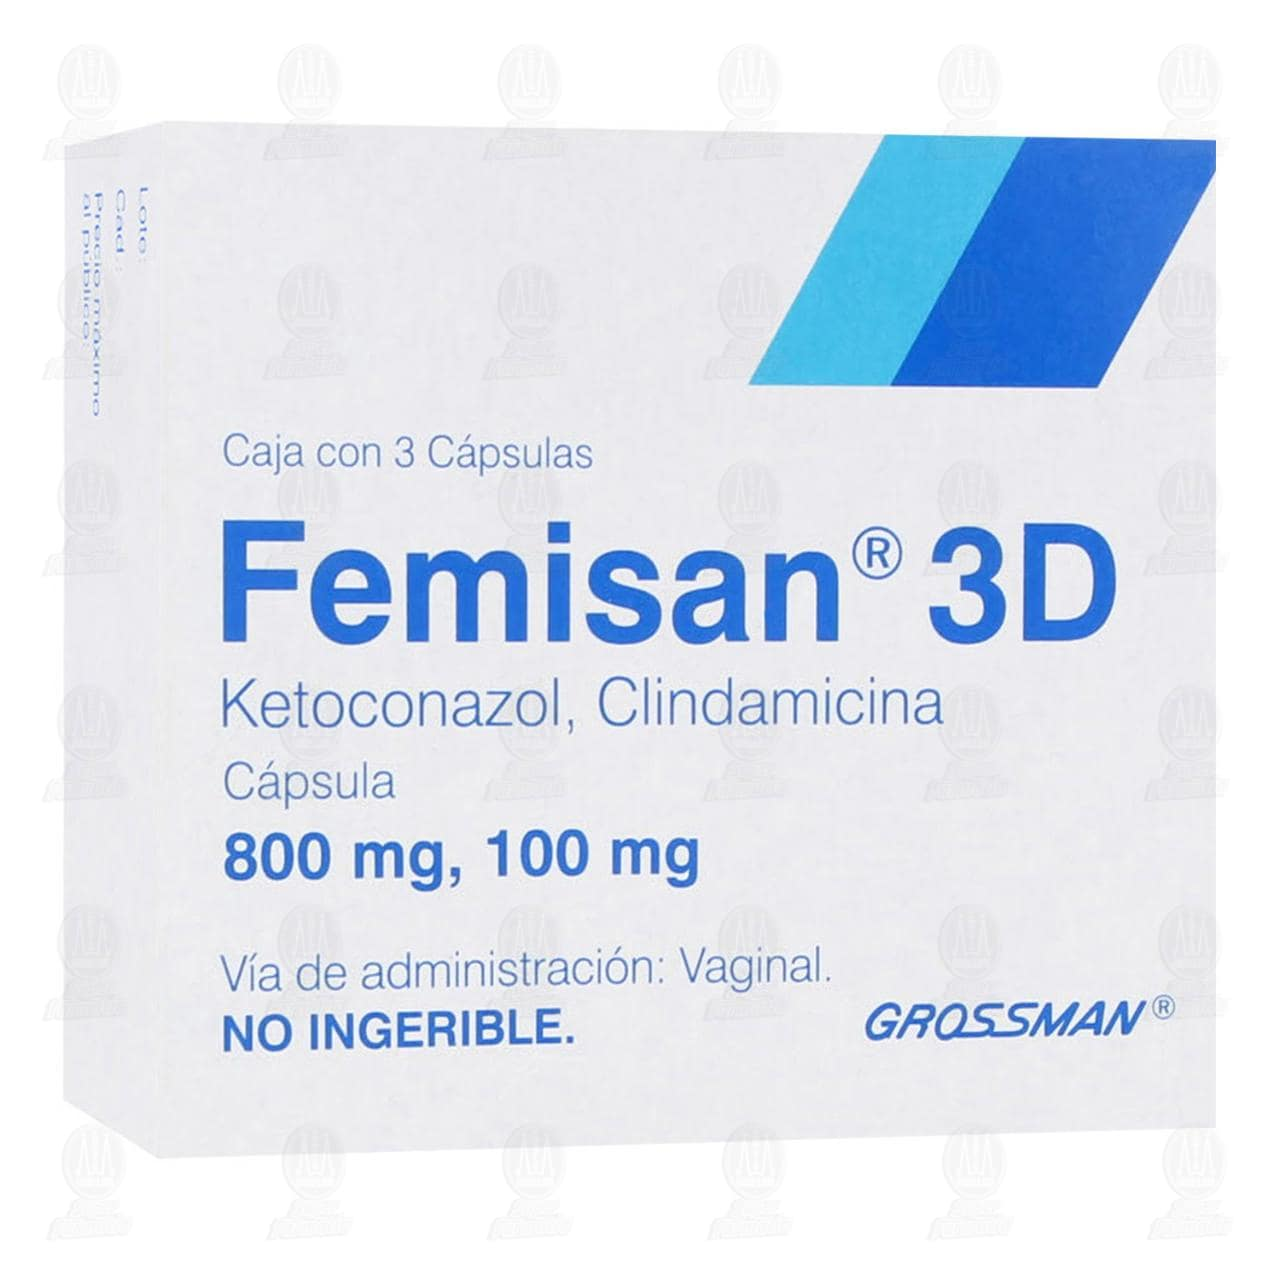 Comprar Femisan 3D 800mg/100mg 3 Cápsulas en Farmacias Guadalajara